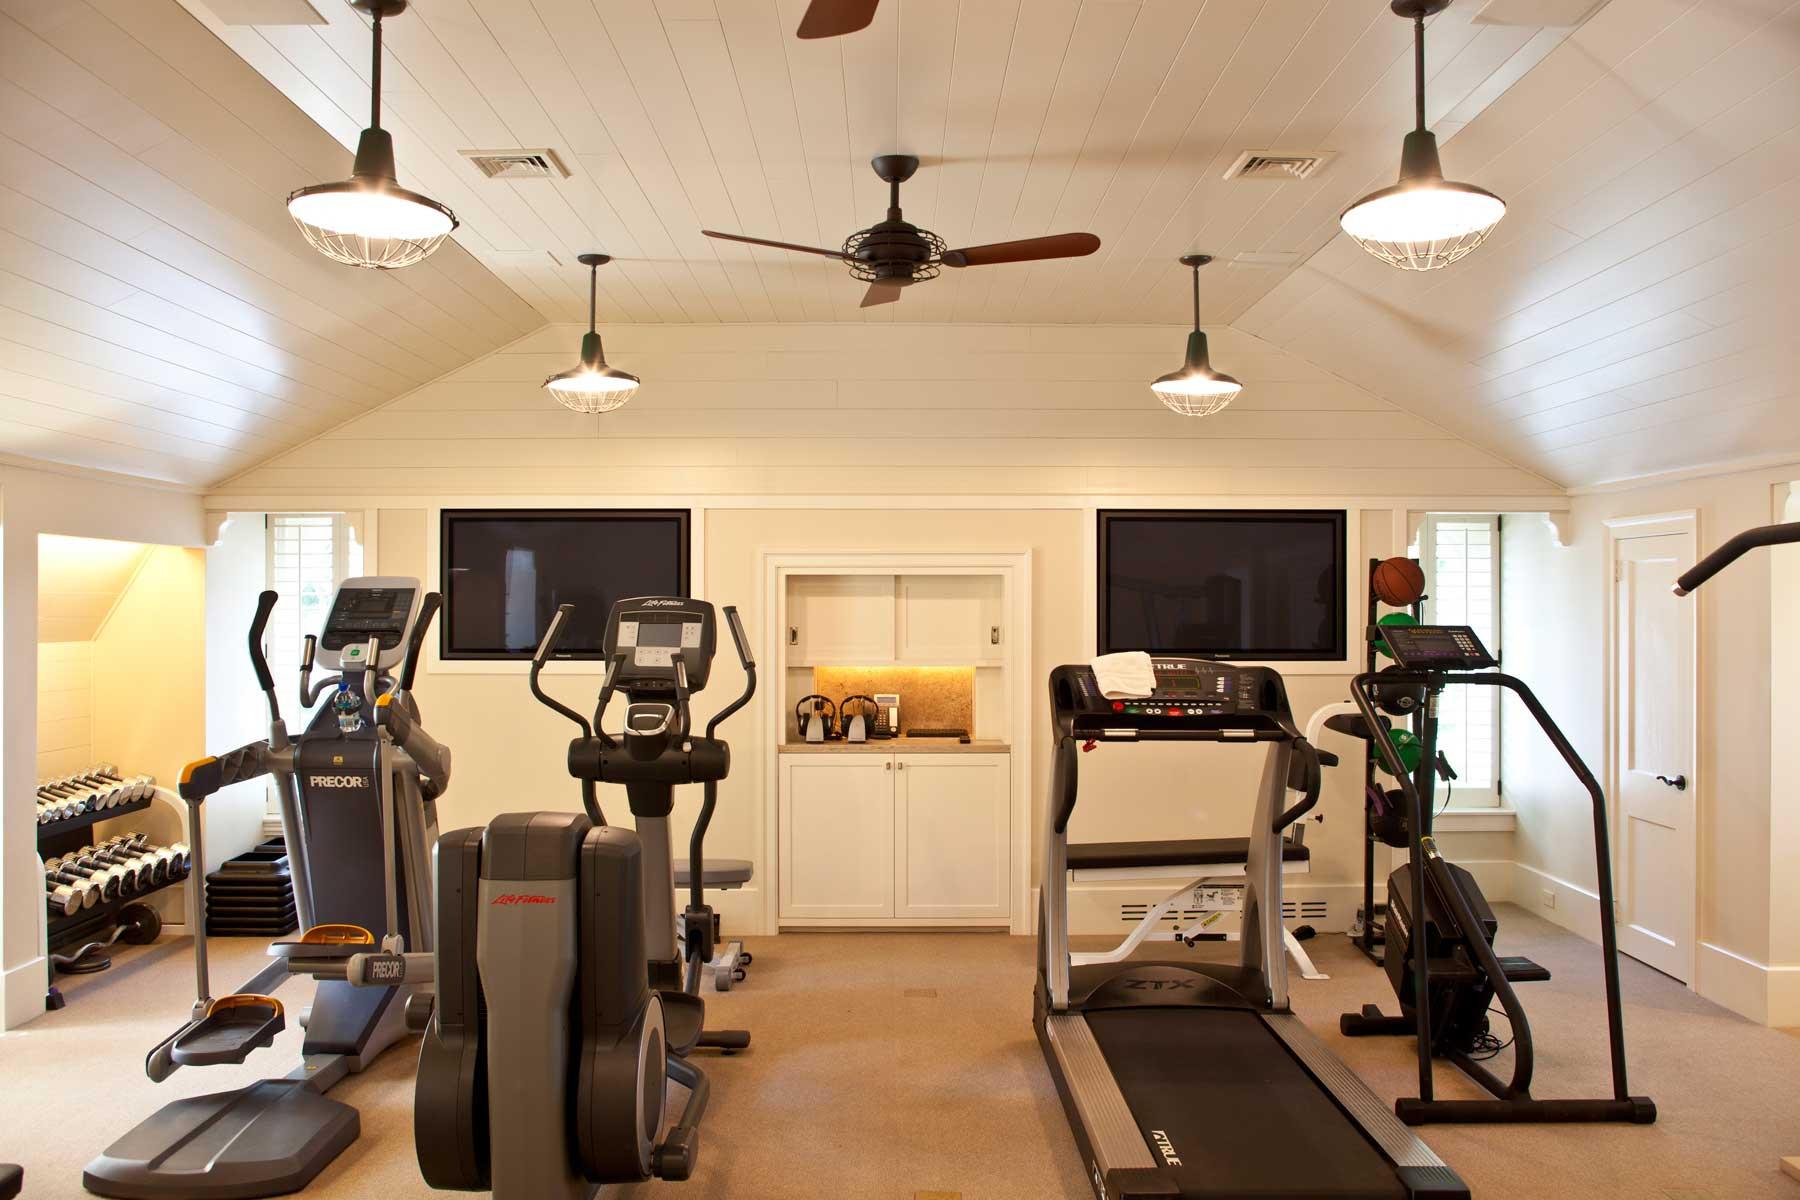 18-gym